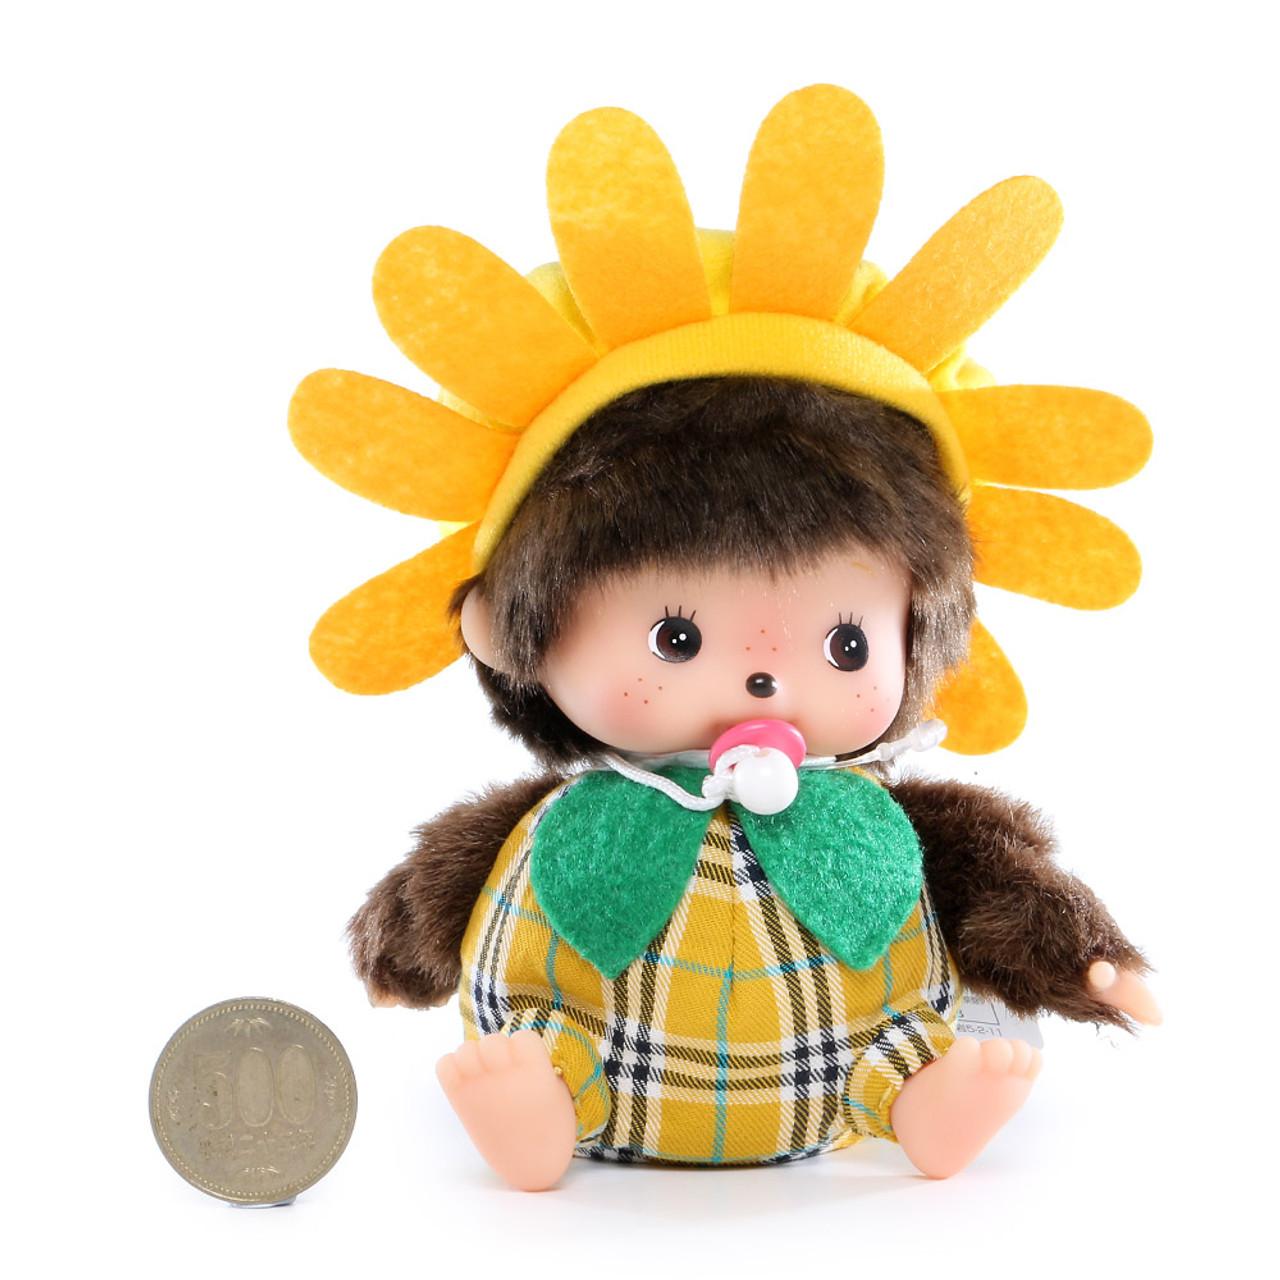 Sekiguchi Bebichhichi Birk Pineapple & Sunflower Costume Baby Plush Doll ( Proportion )